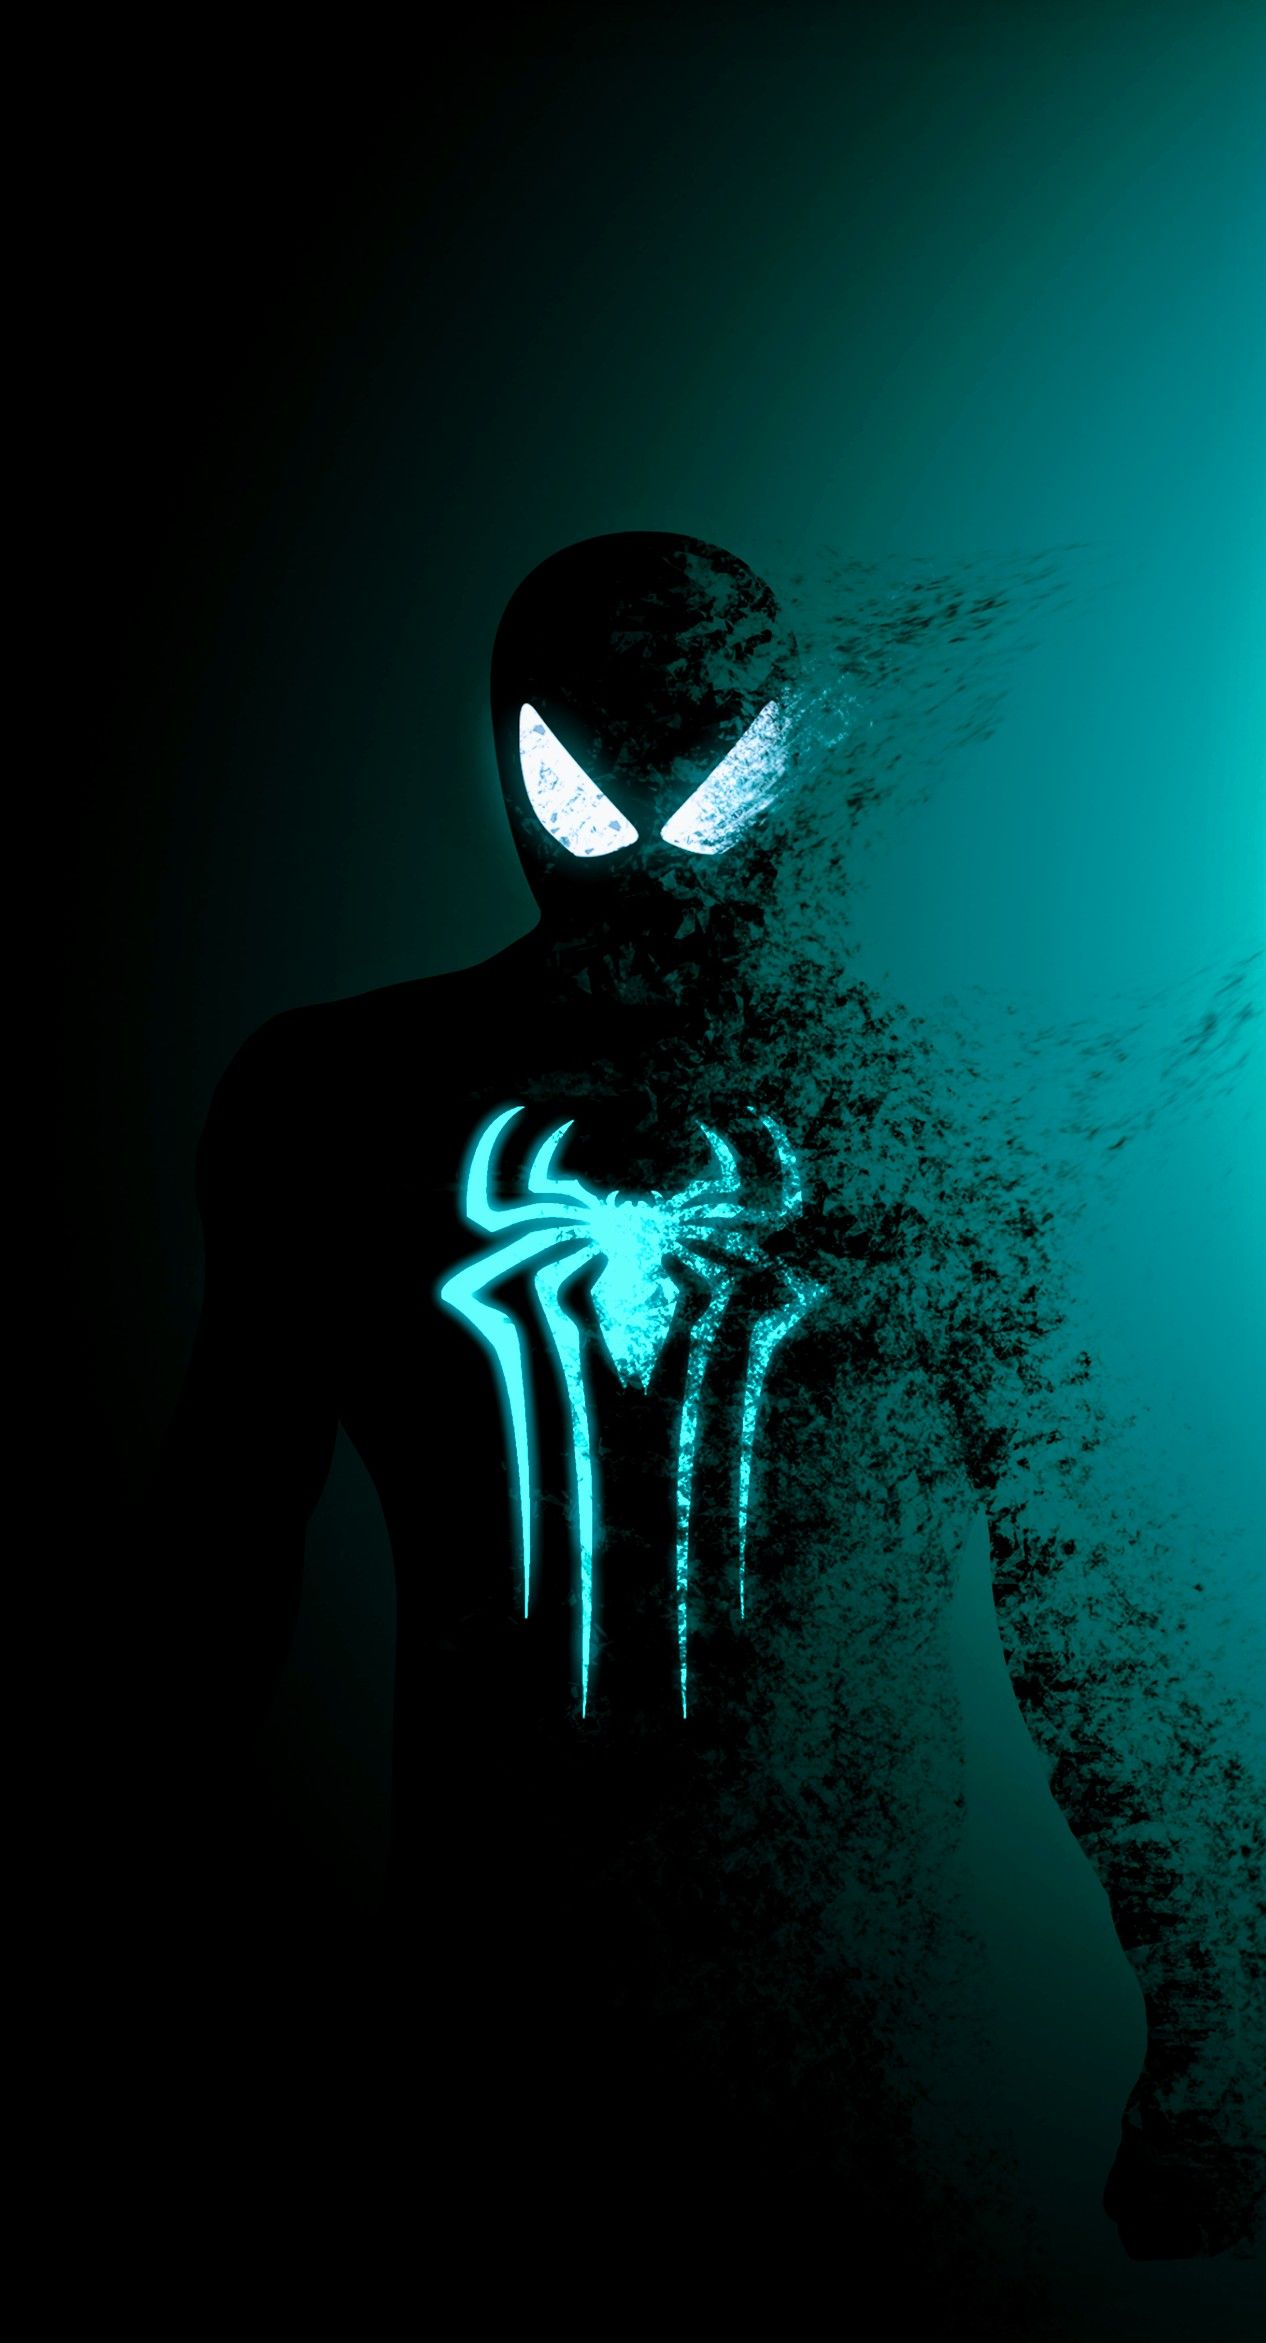 Spider Man Art Heros Films De Super Heros Personnages Graffiti